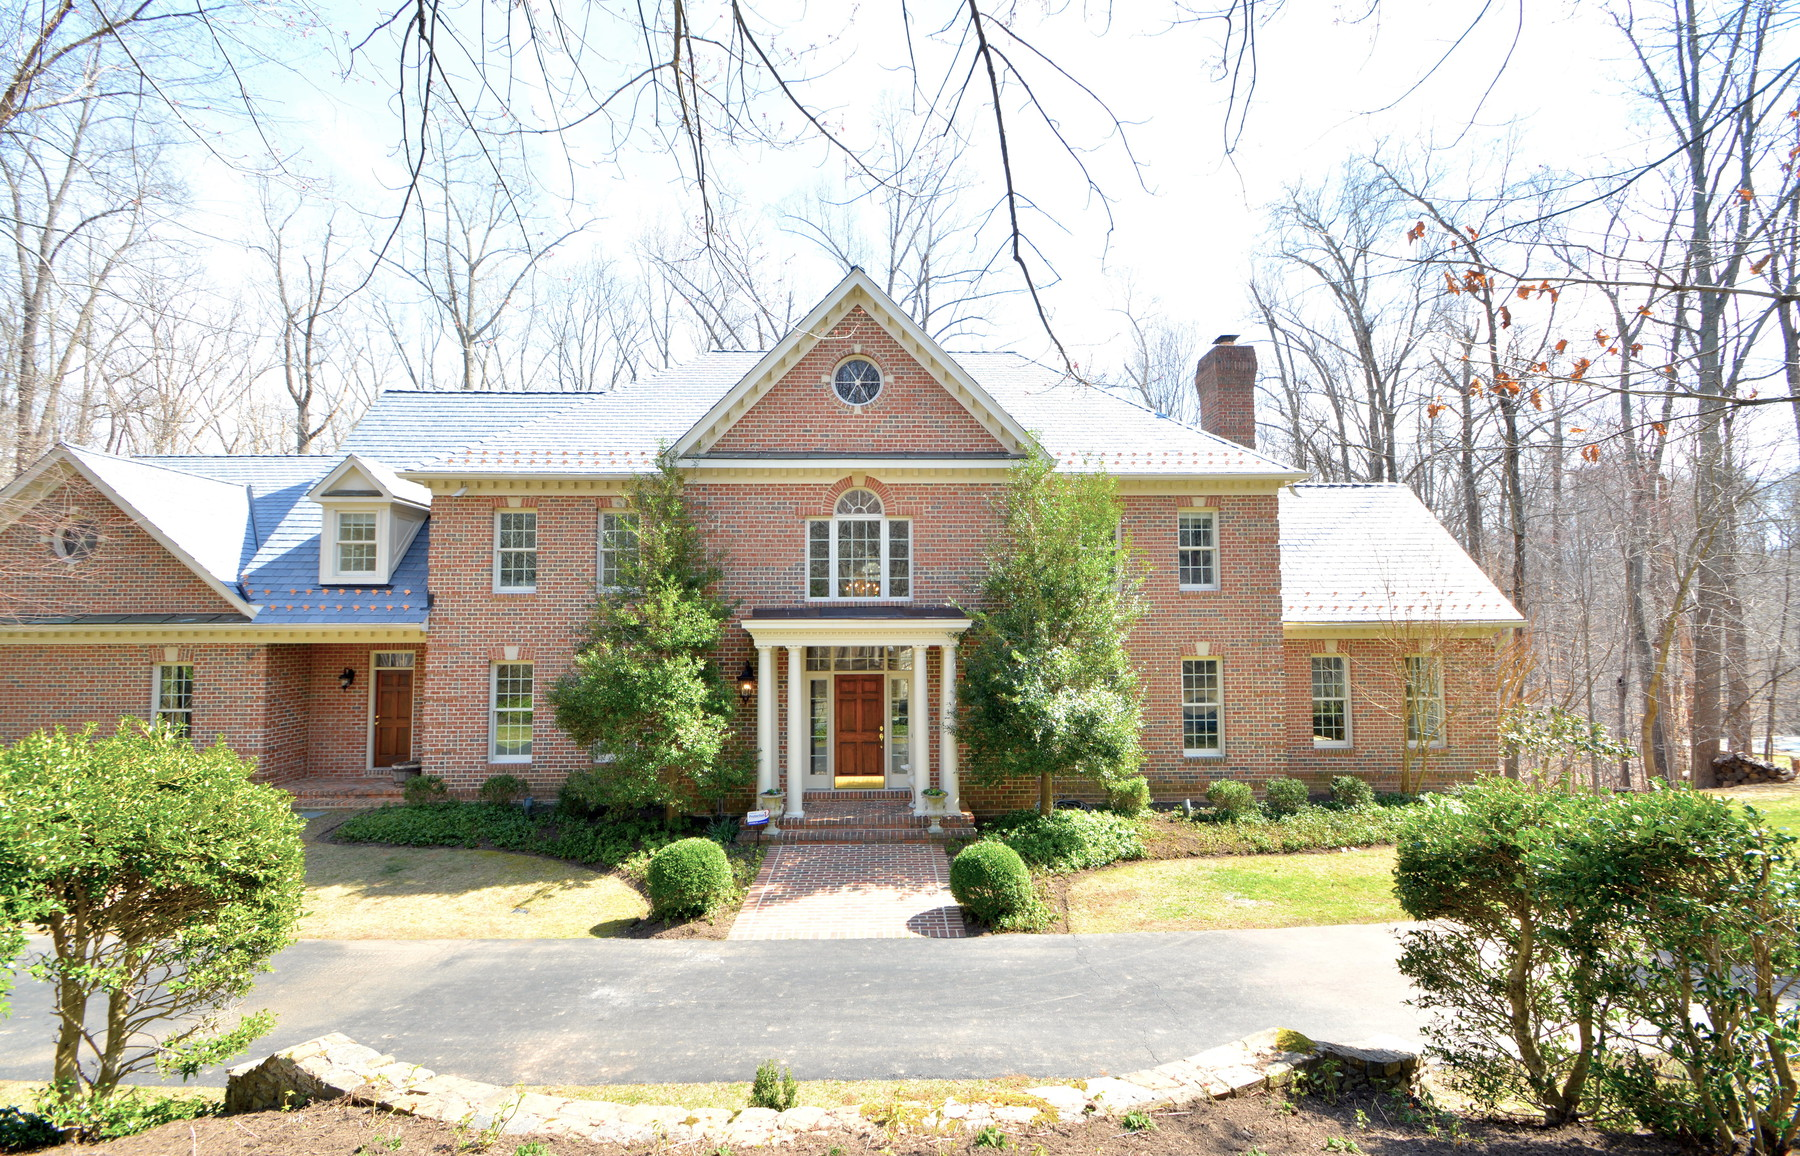 獨棟家庭住宅 為 出售 在 10116 High Hill Court, Great Falls 10116 High Hill Ct Great Falls, 弗吉尼亞州, 22066 美國